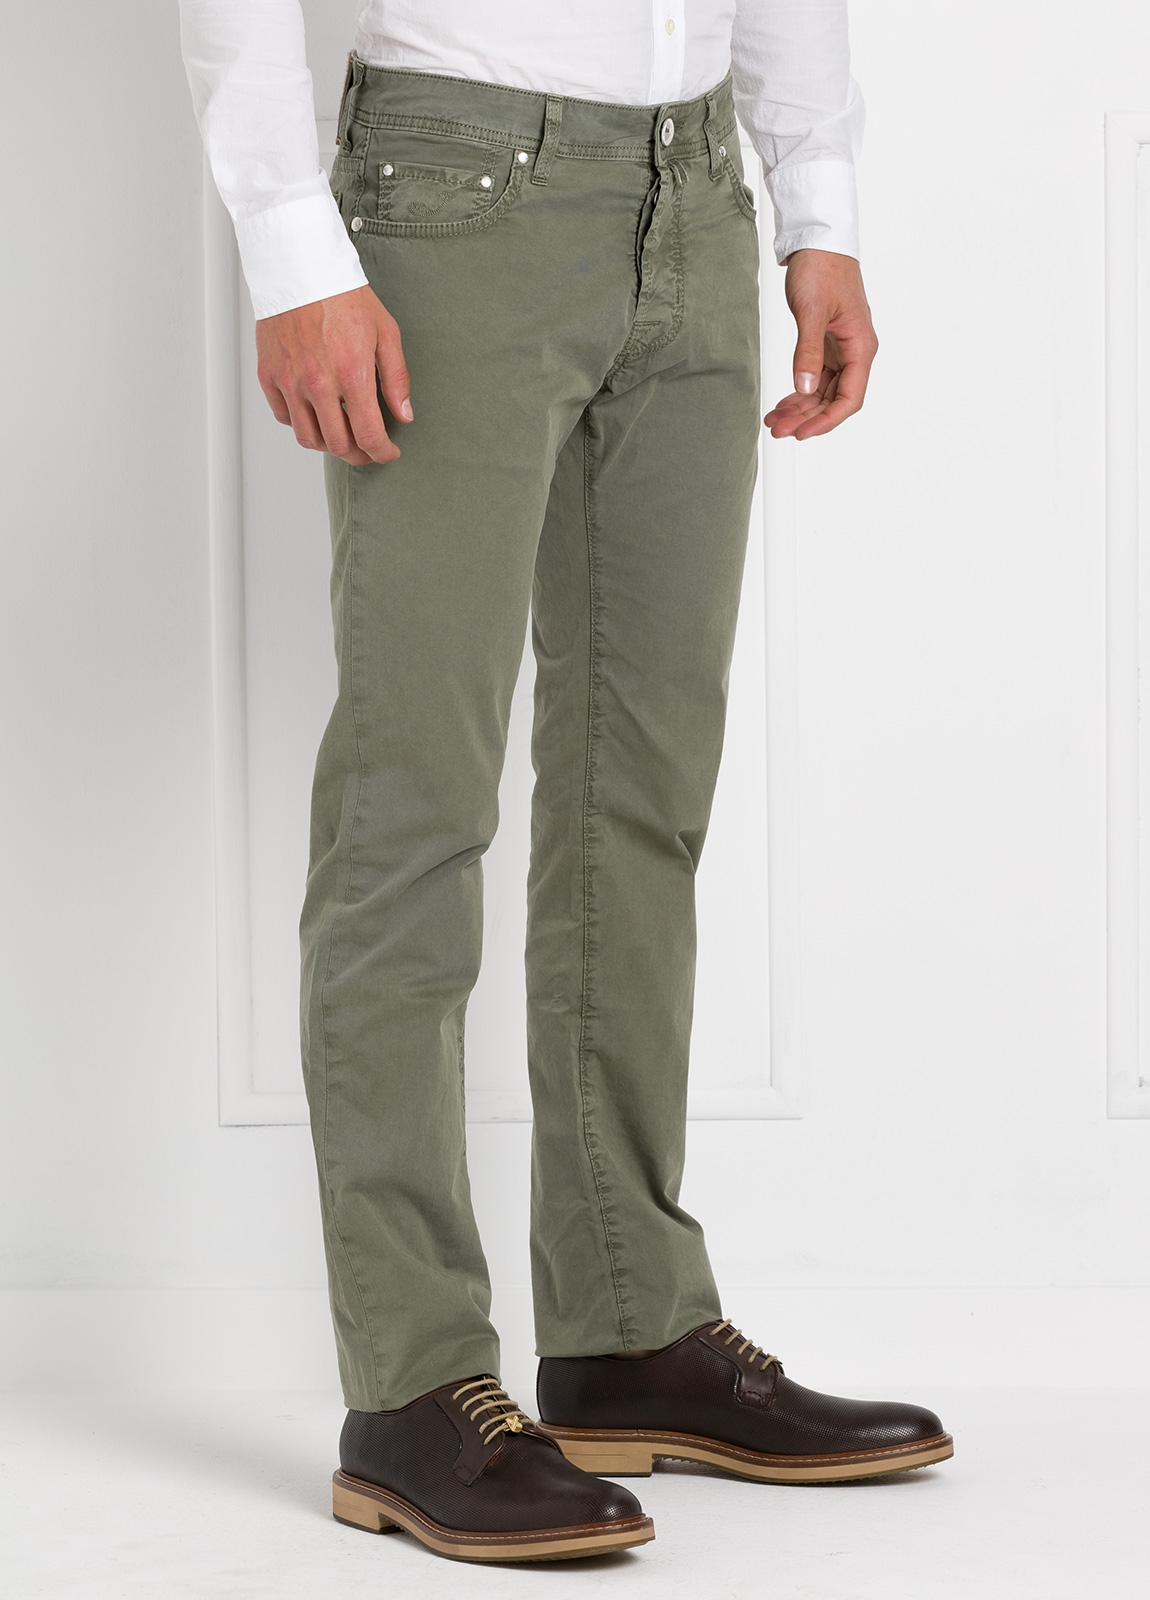 Pantalón cinco bolsillos modelo PW688 color kaki. Algodón gabardina vintage. - Ítem2